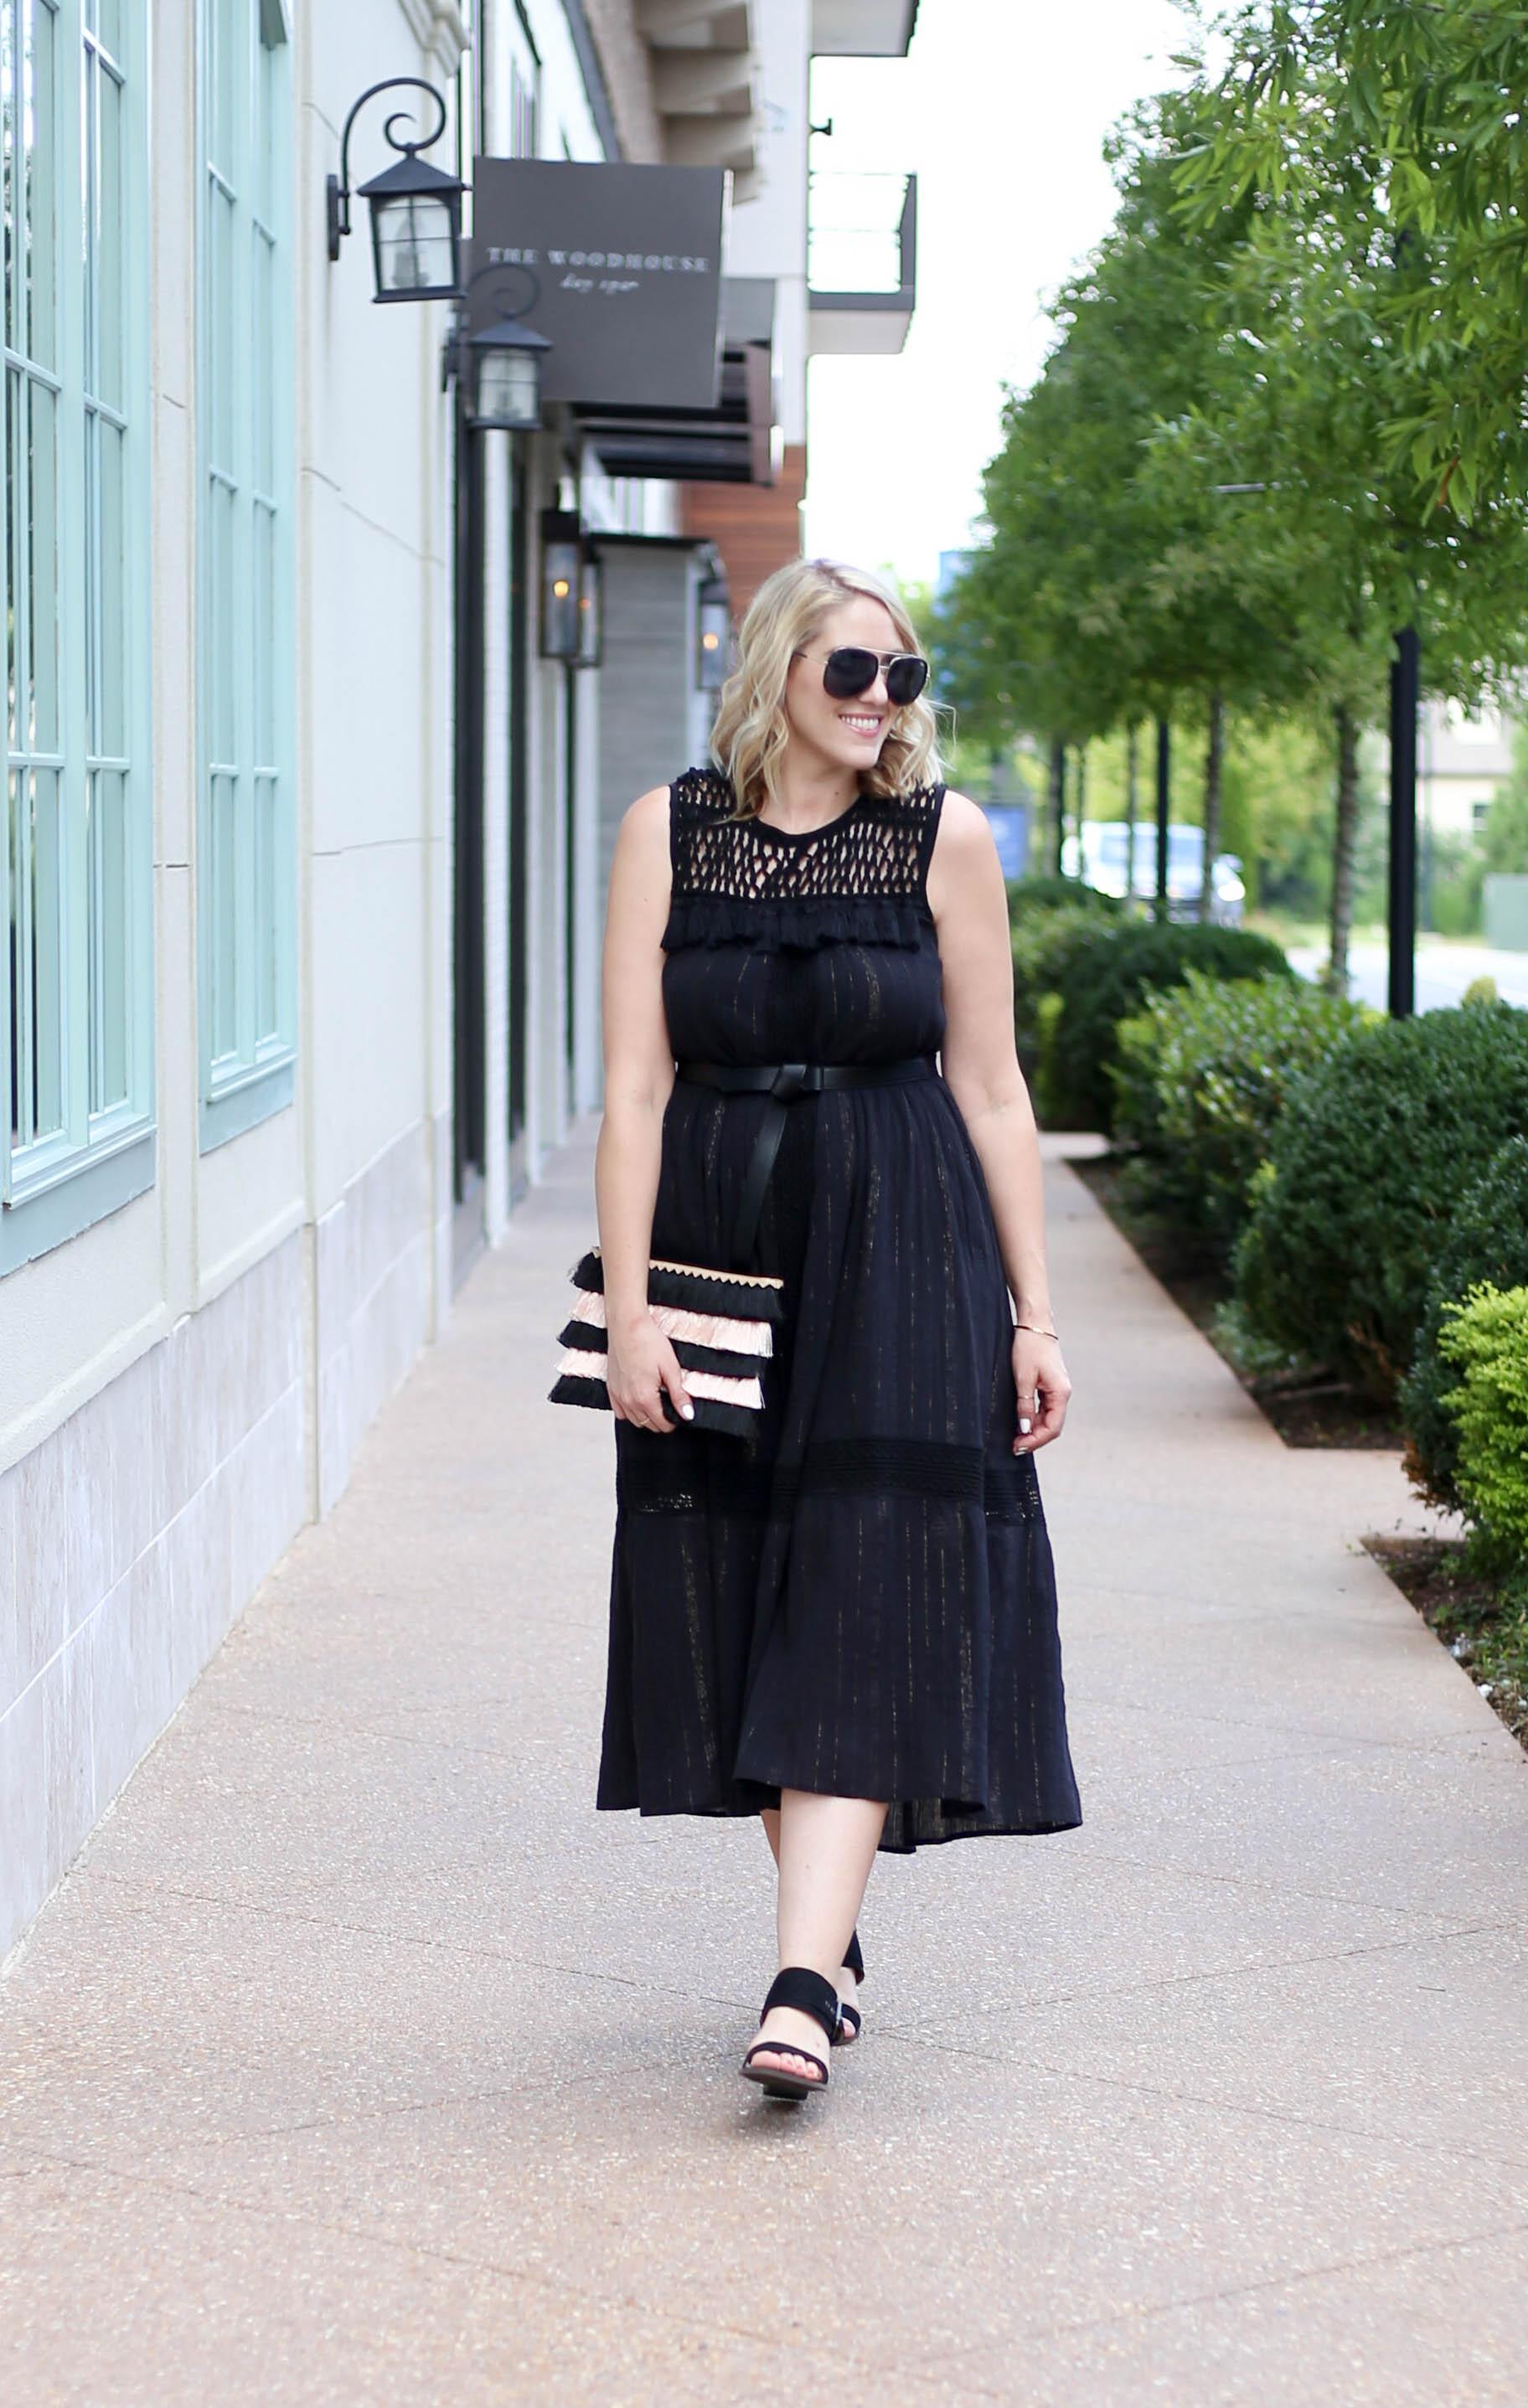 black boho dress midi dress #bohodress #bohooutfit #fashionblogger